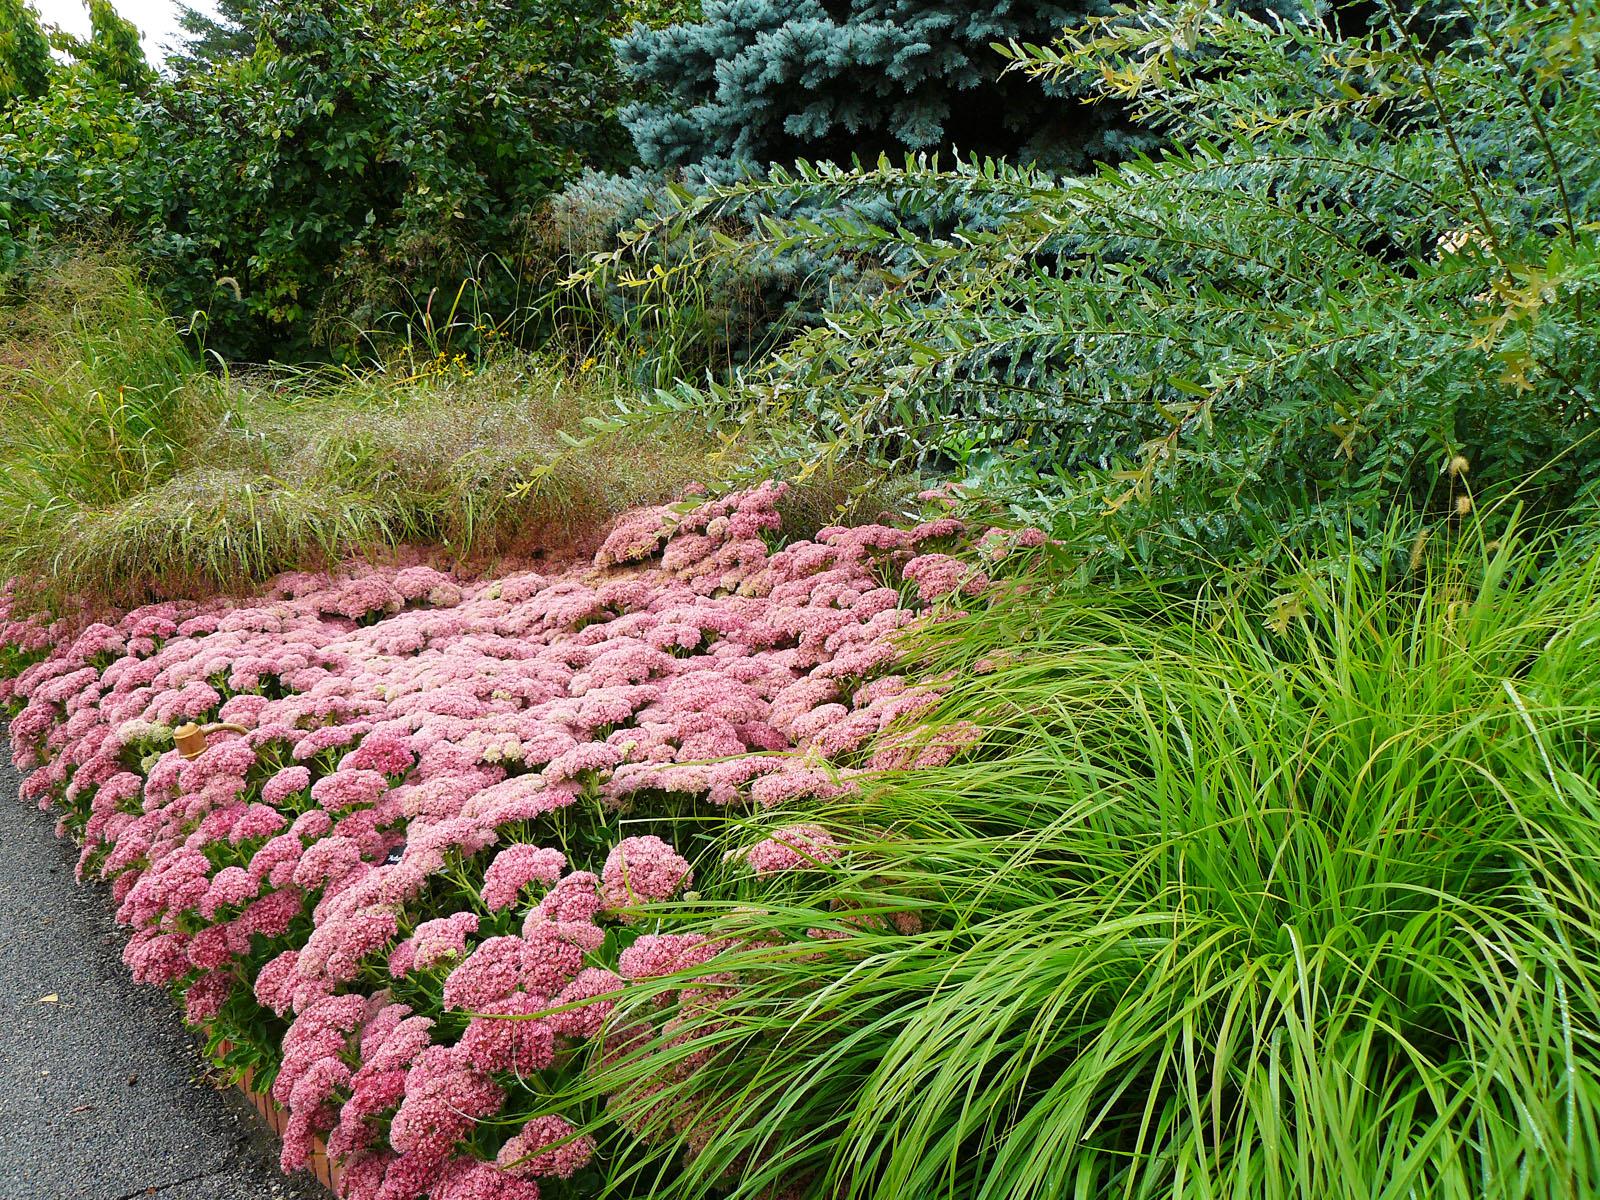 Minnesota Landscape Arboretum2_by_julieweisenhorn